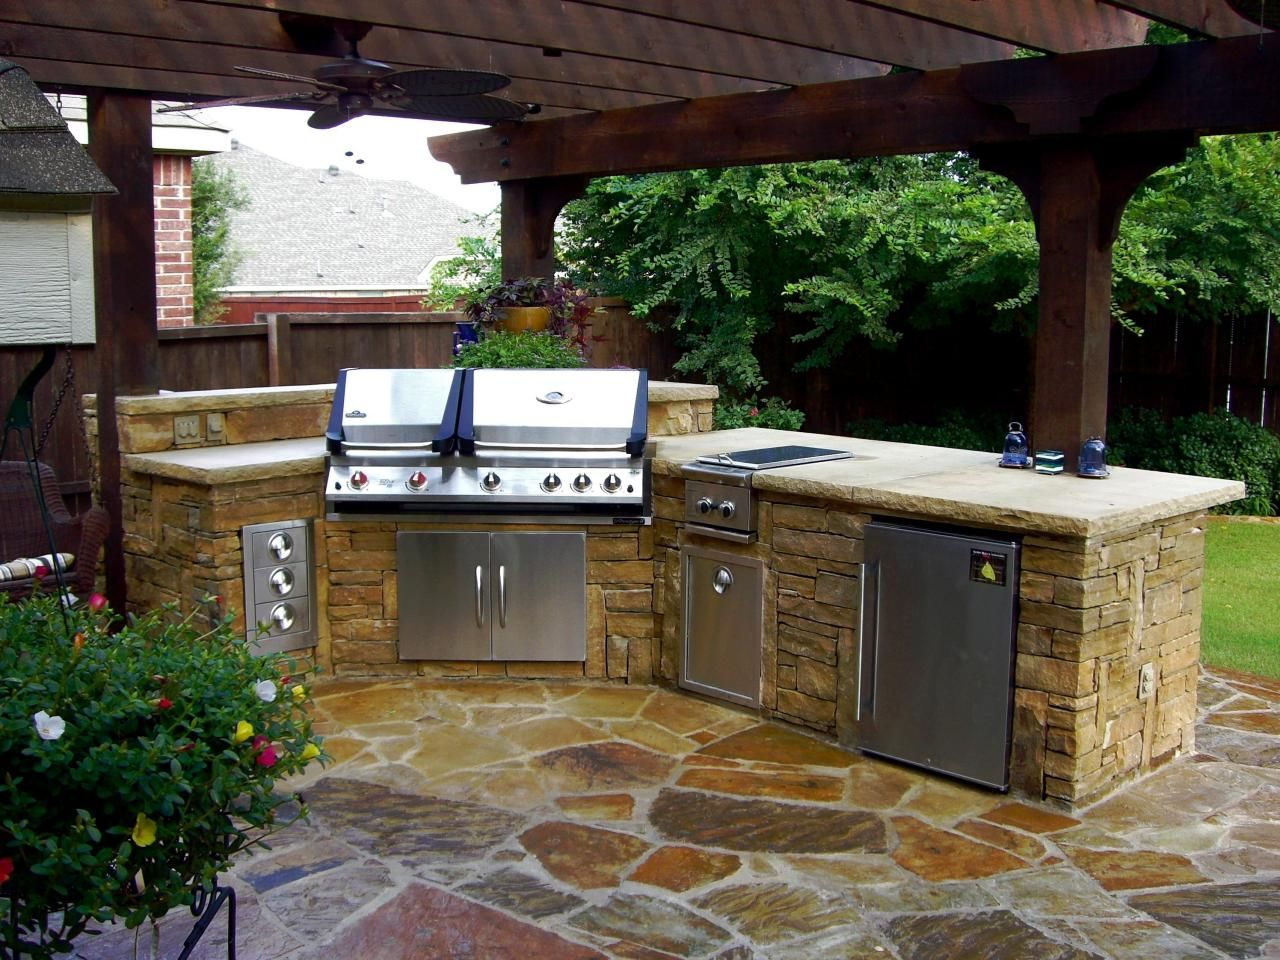 33 amazing outdoor kitchens backyard ideas outdoor kitchen plans diy outdoor kitchen on outdoor kitchen diy id=45026